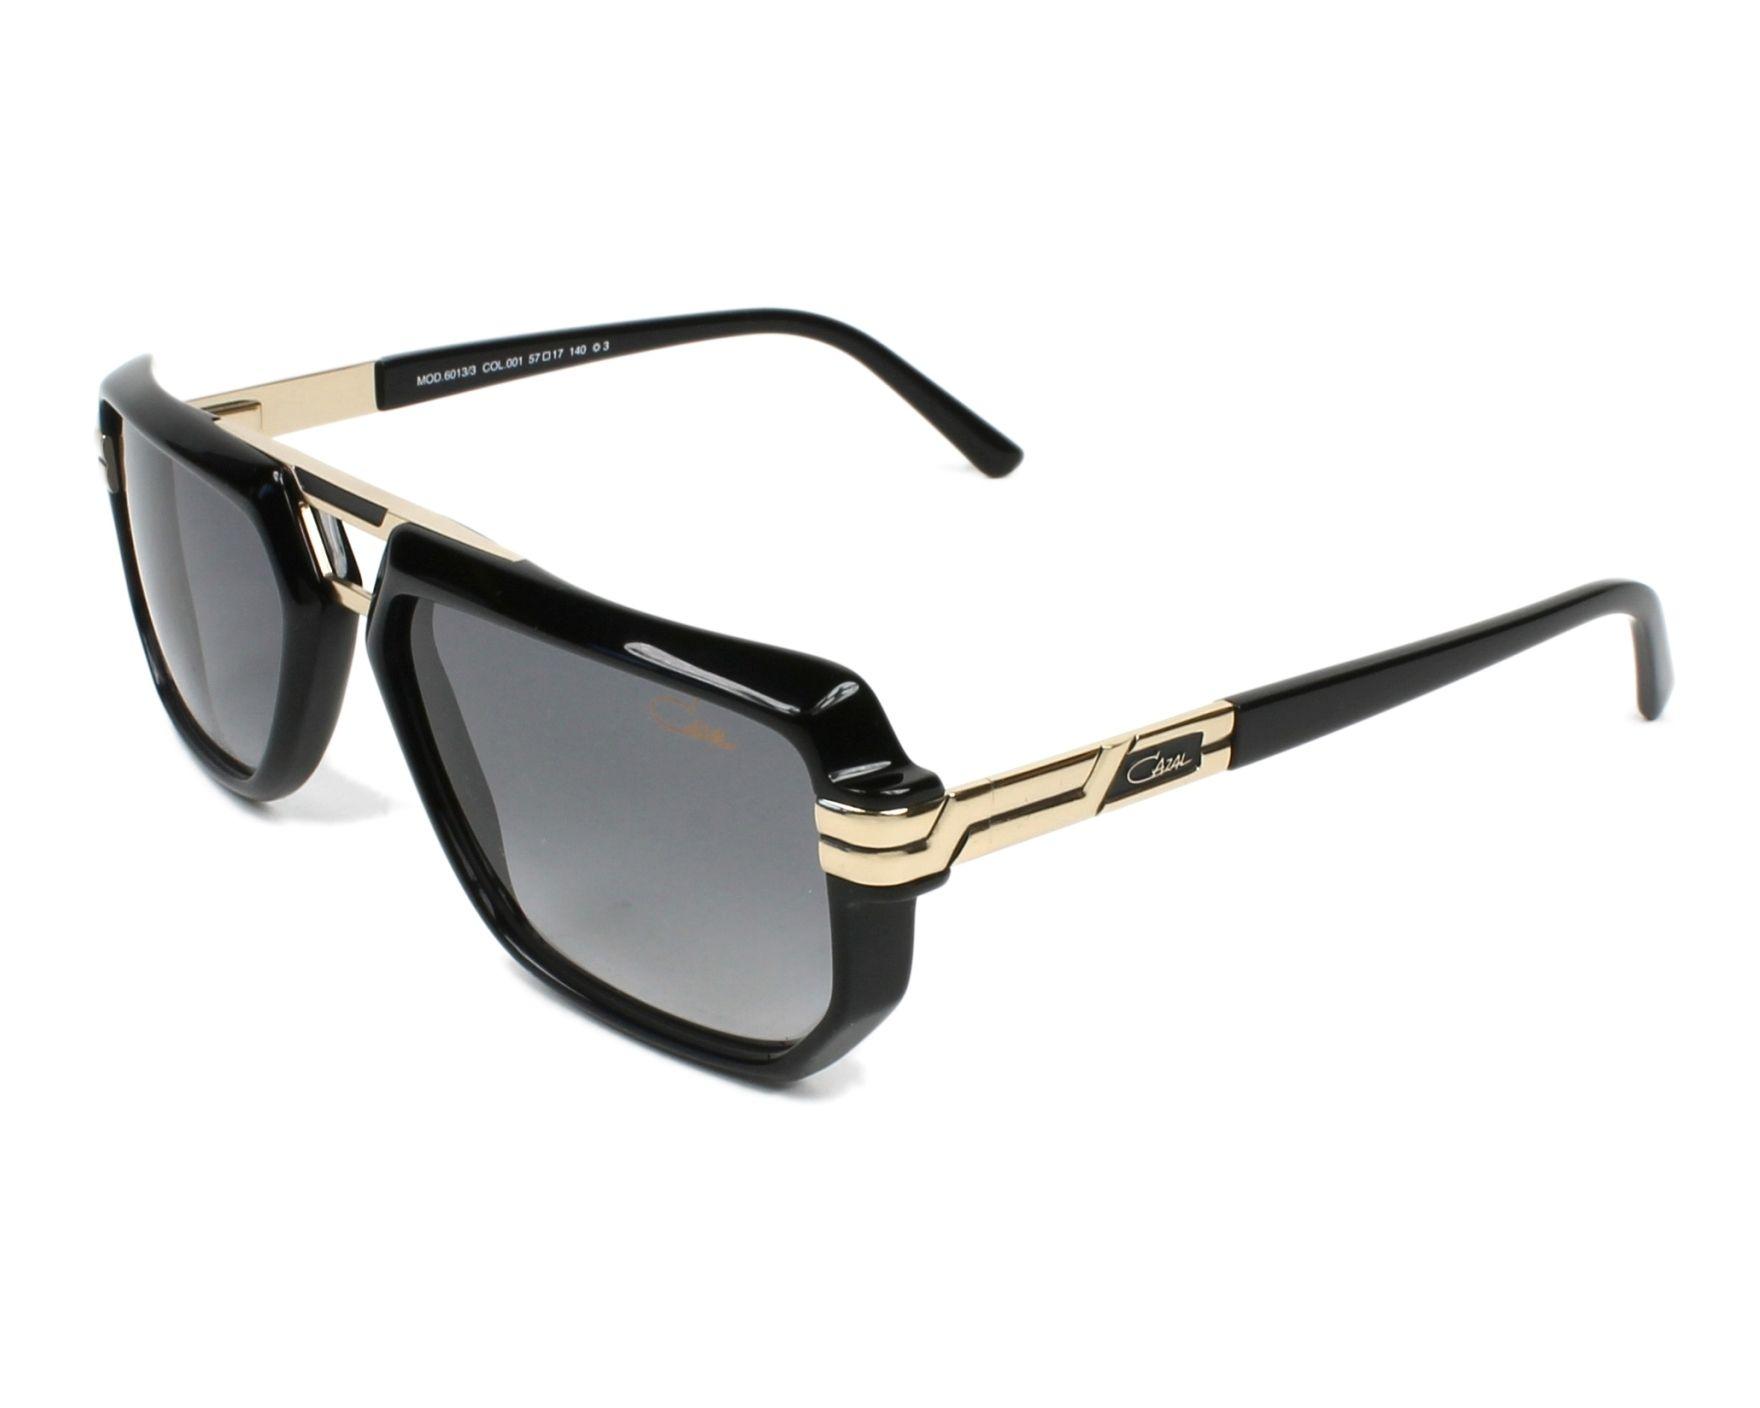 385813cfb06 Sunglasses Cazal 6013-3 001 57-17 Black Gold profile view